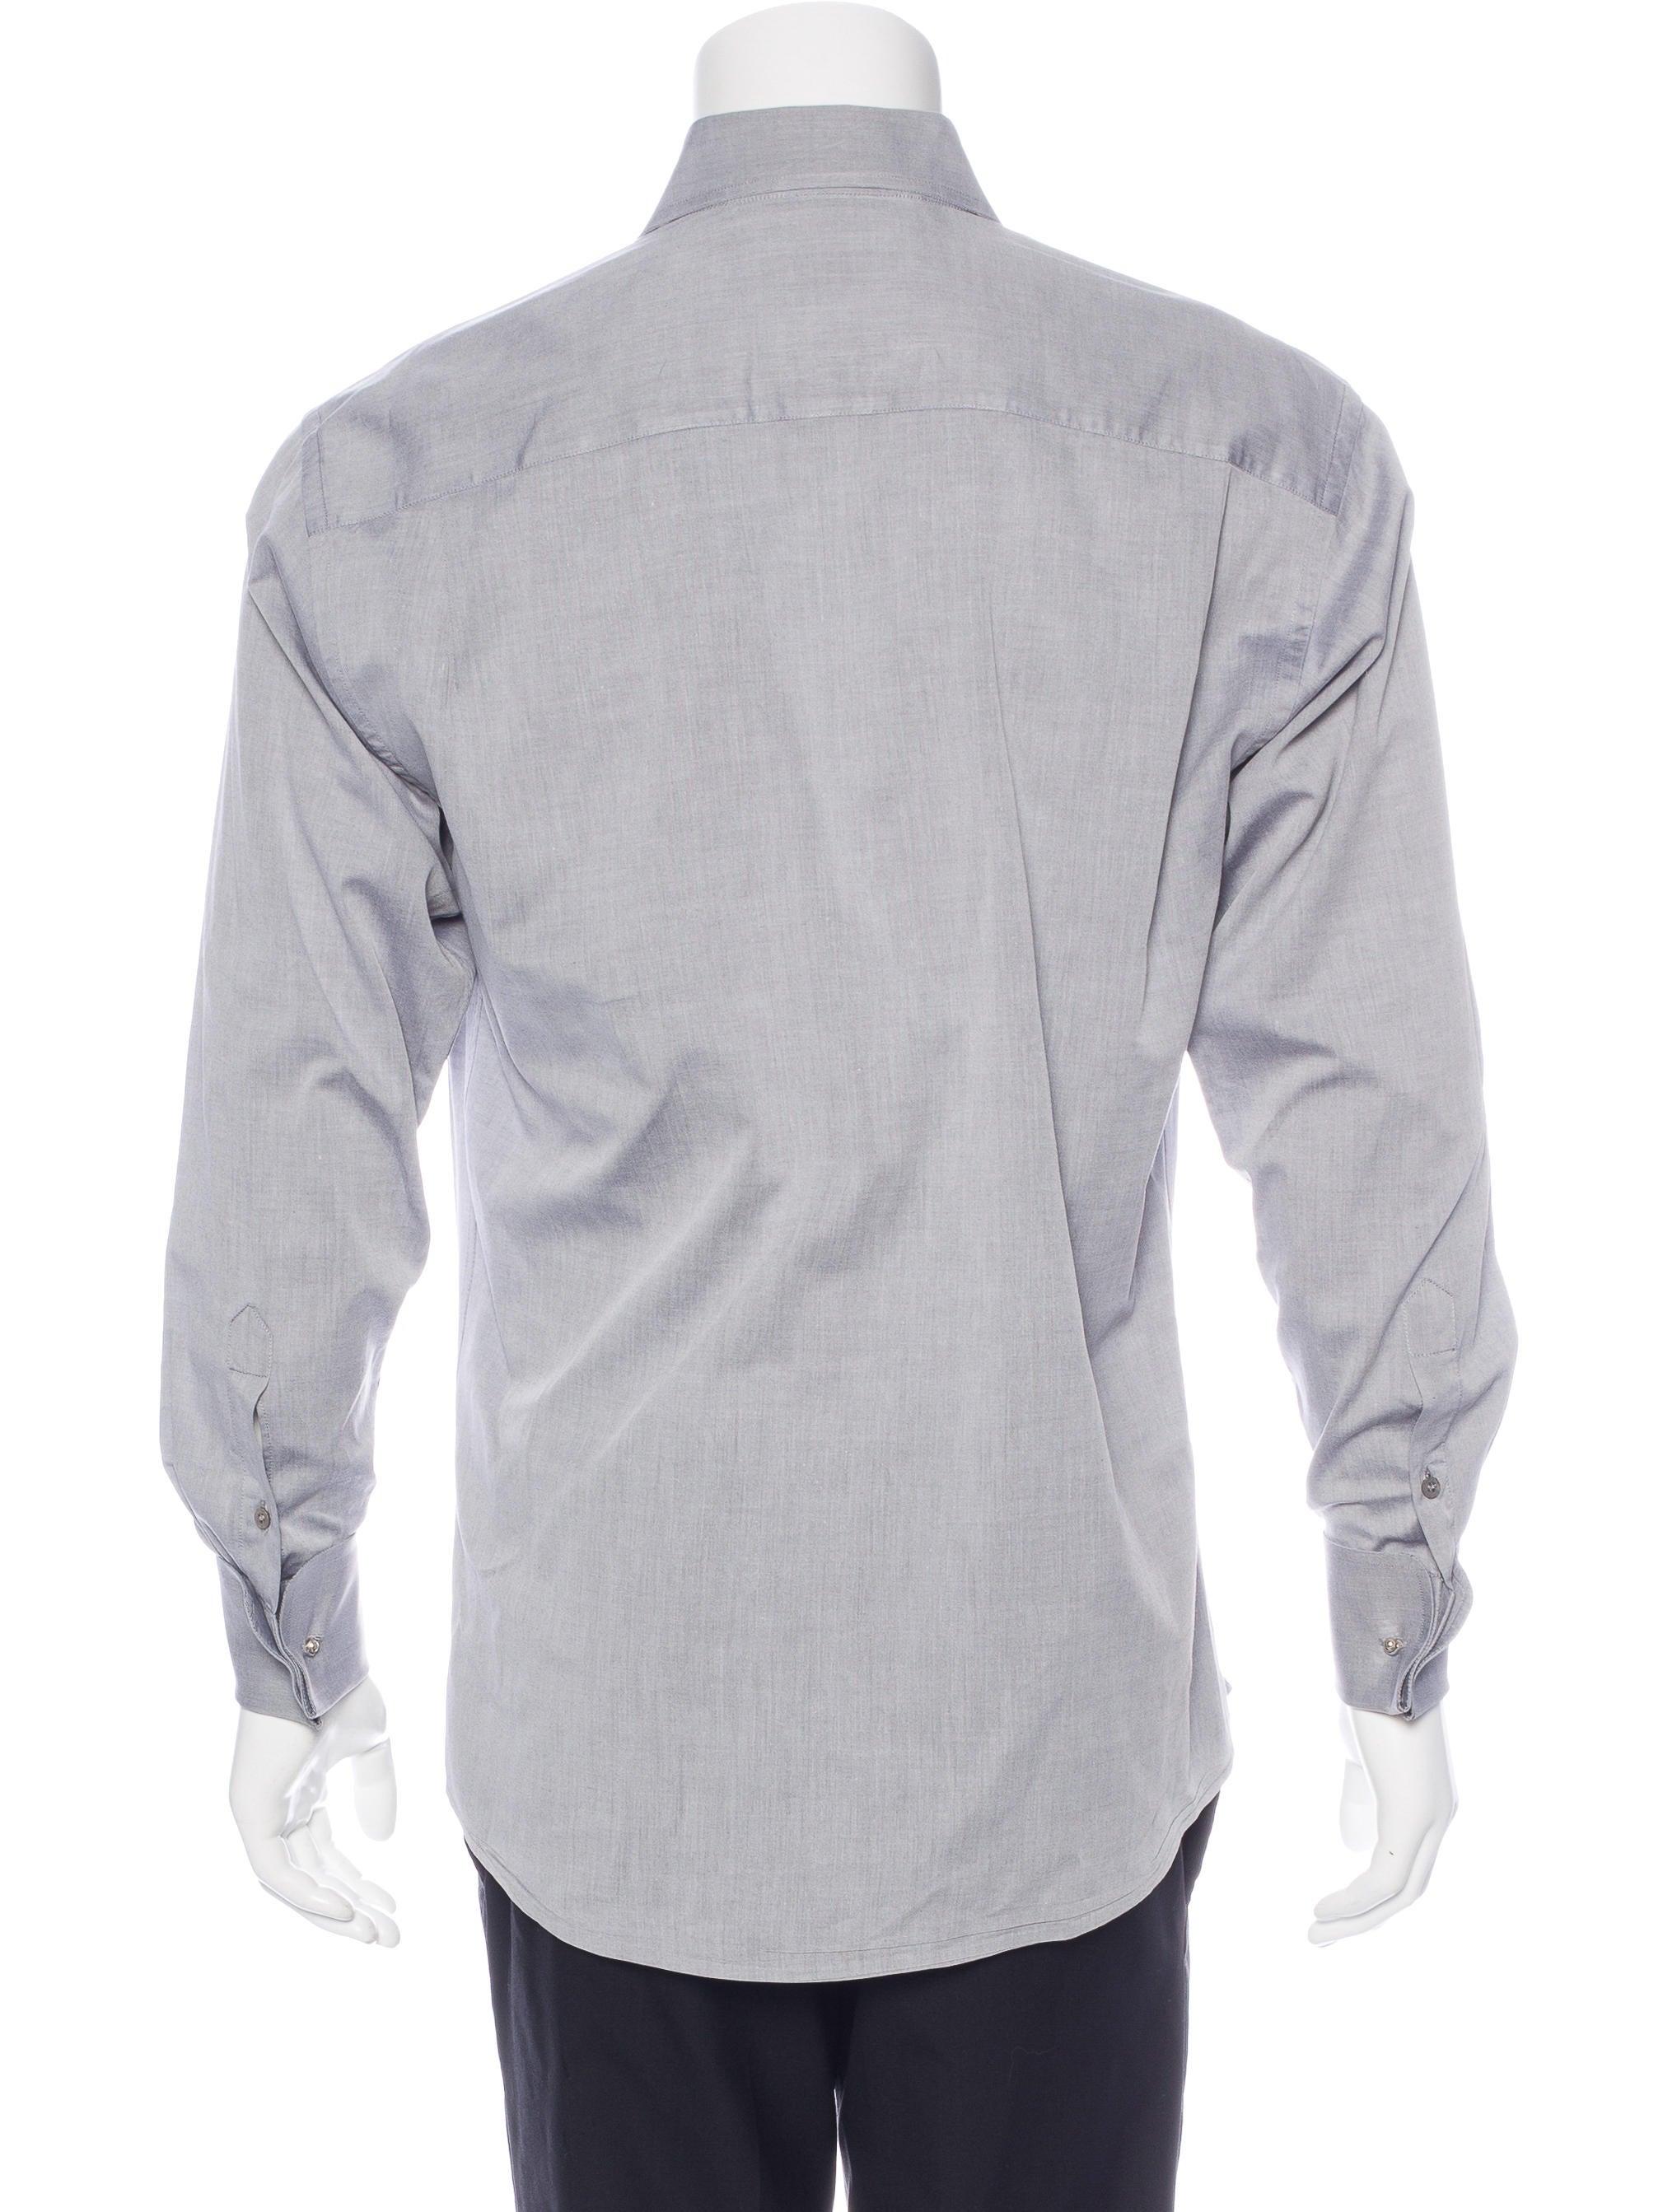 Gucci french cuff dress shirt clothing guc153576 the for Pin collar shirt double cuff